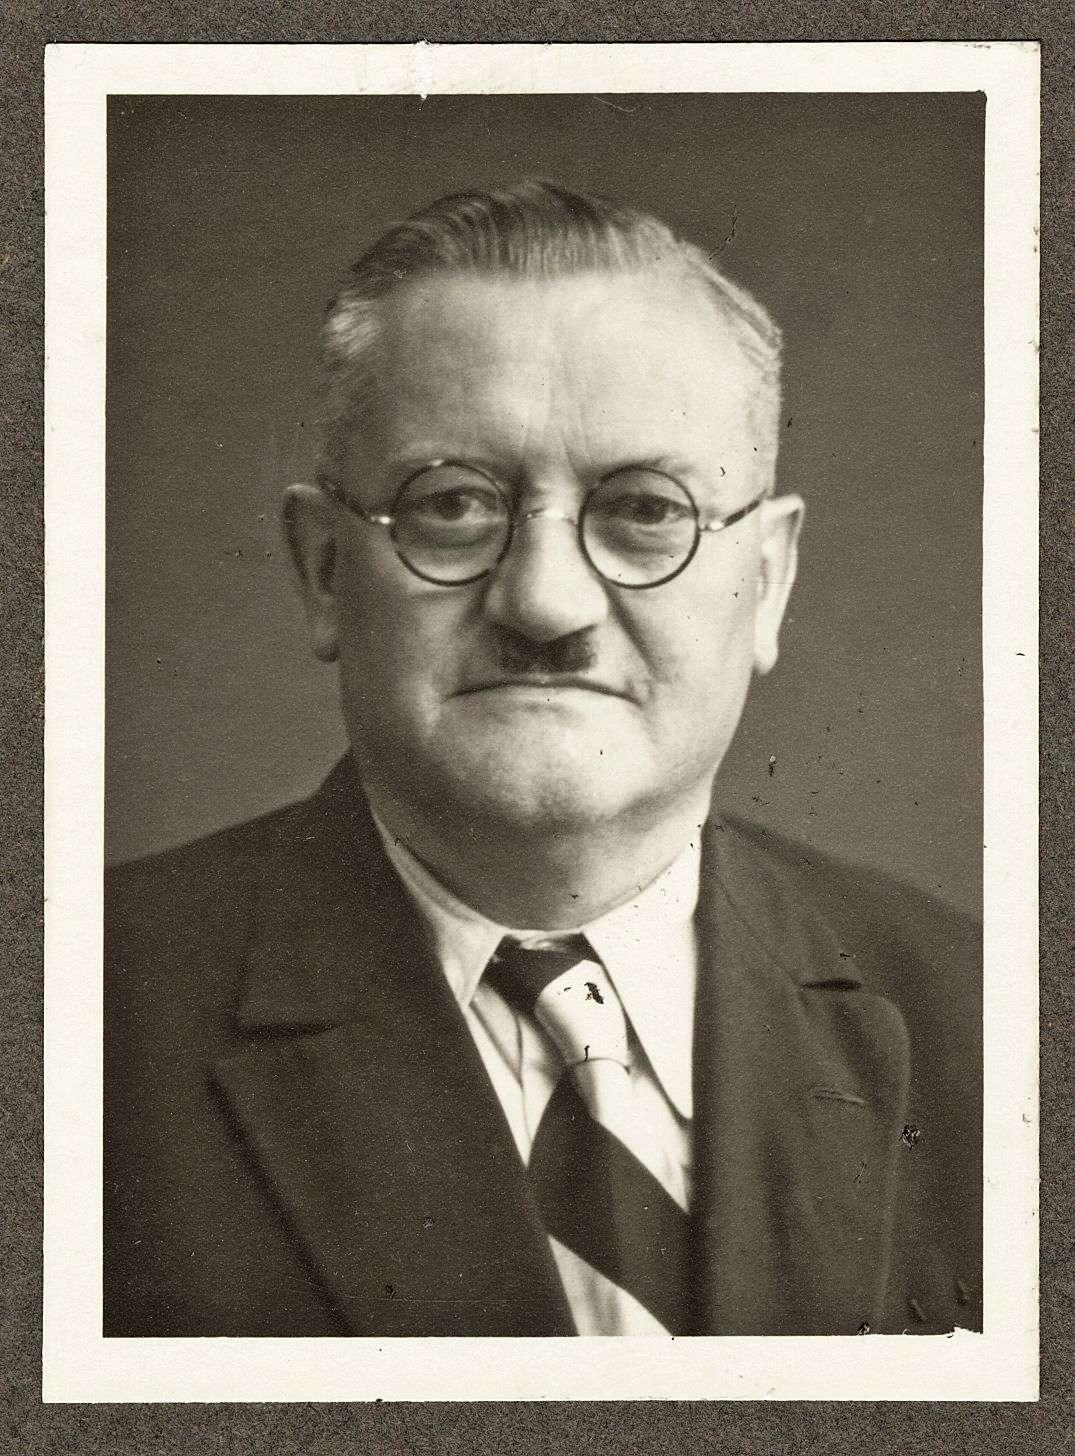 Schmidtbleicher, Hugo, Bild 1